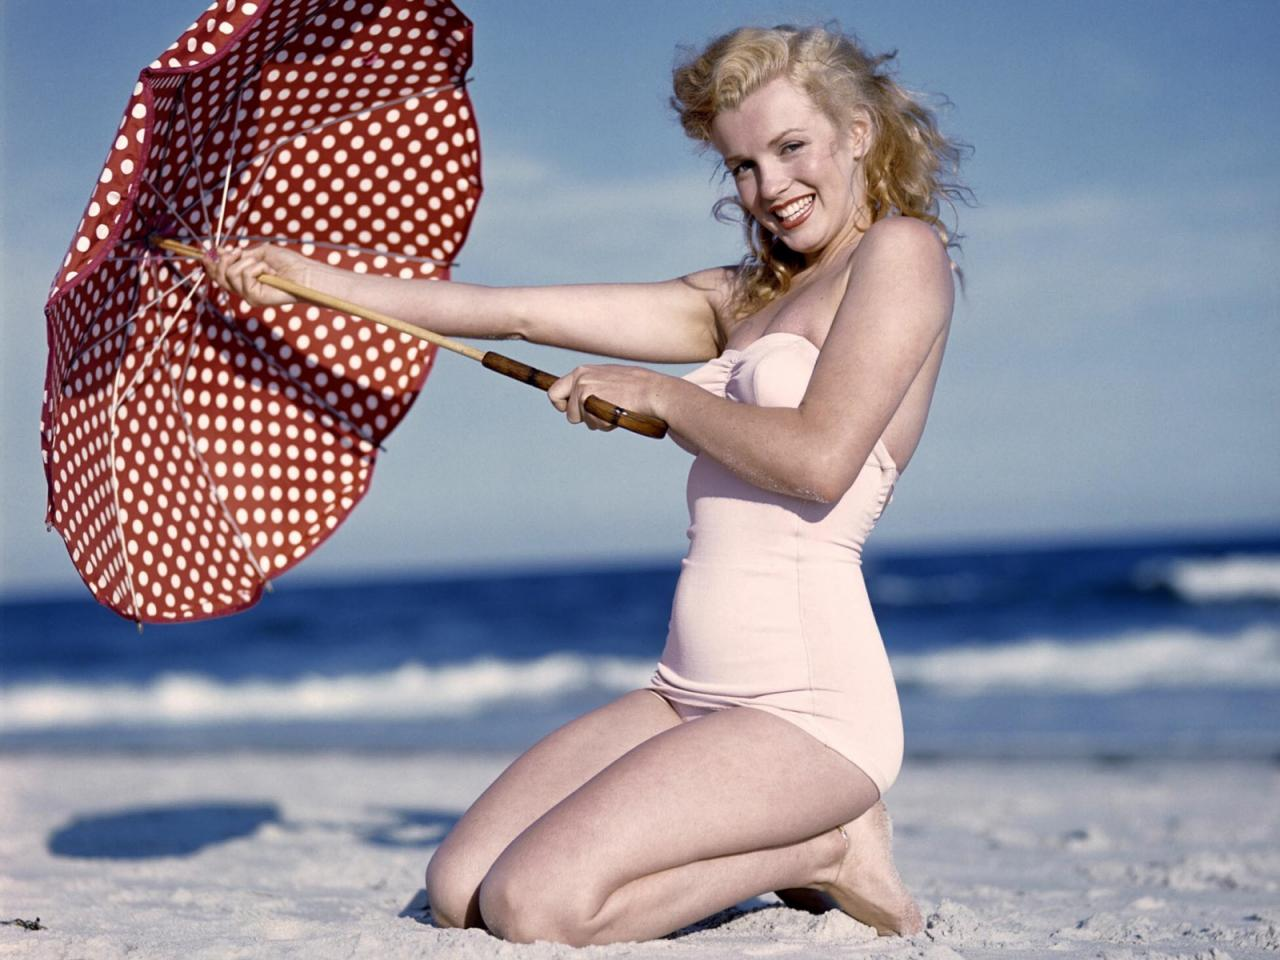 http://4.bp.blogspot.com/-0lF30e1sml0/UB-R7F6IszI/AAAAAAAAEN8/YWQHKoaSJuA/s1600/Marilyn_Monroe.jpg